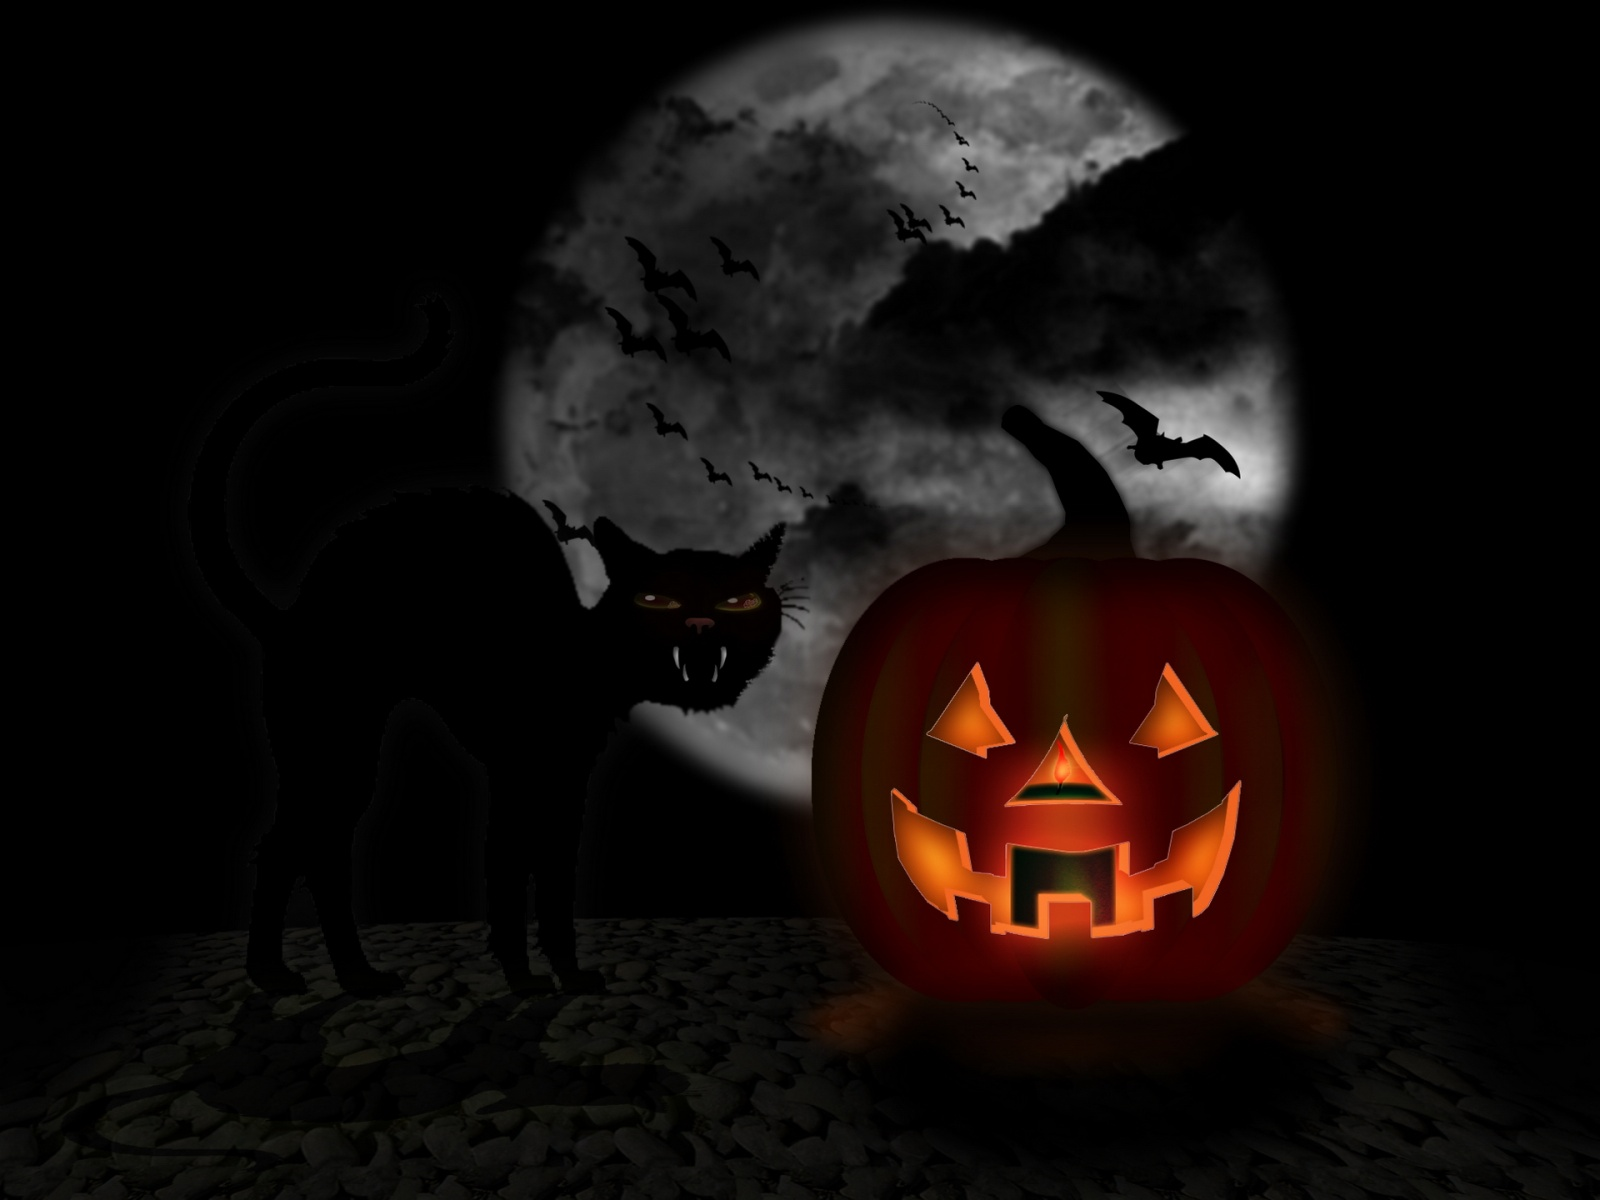 trololo blogg Cute Halloween Wallpaper Desktop 1600x1200